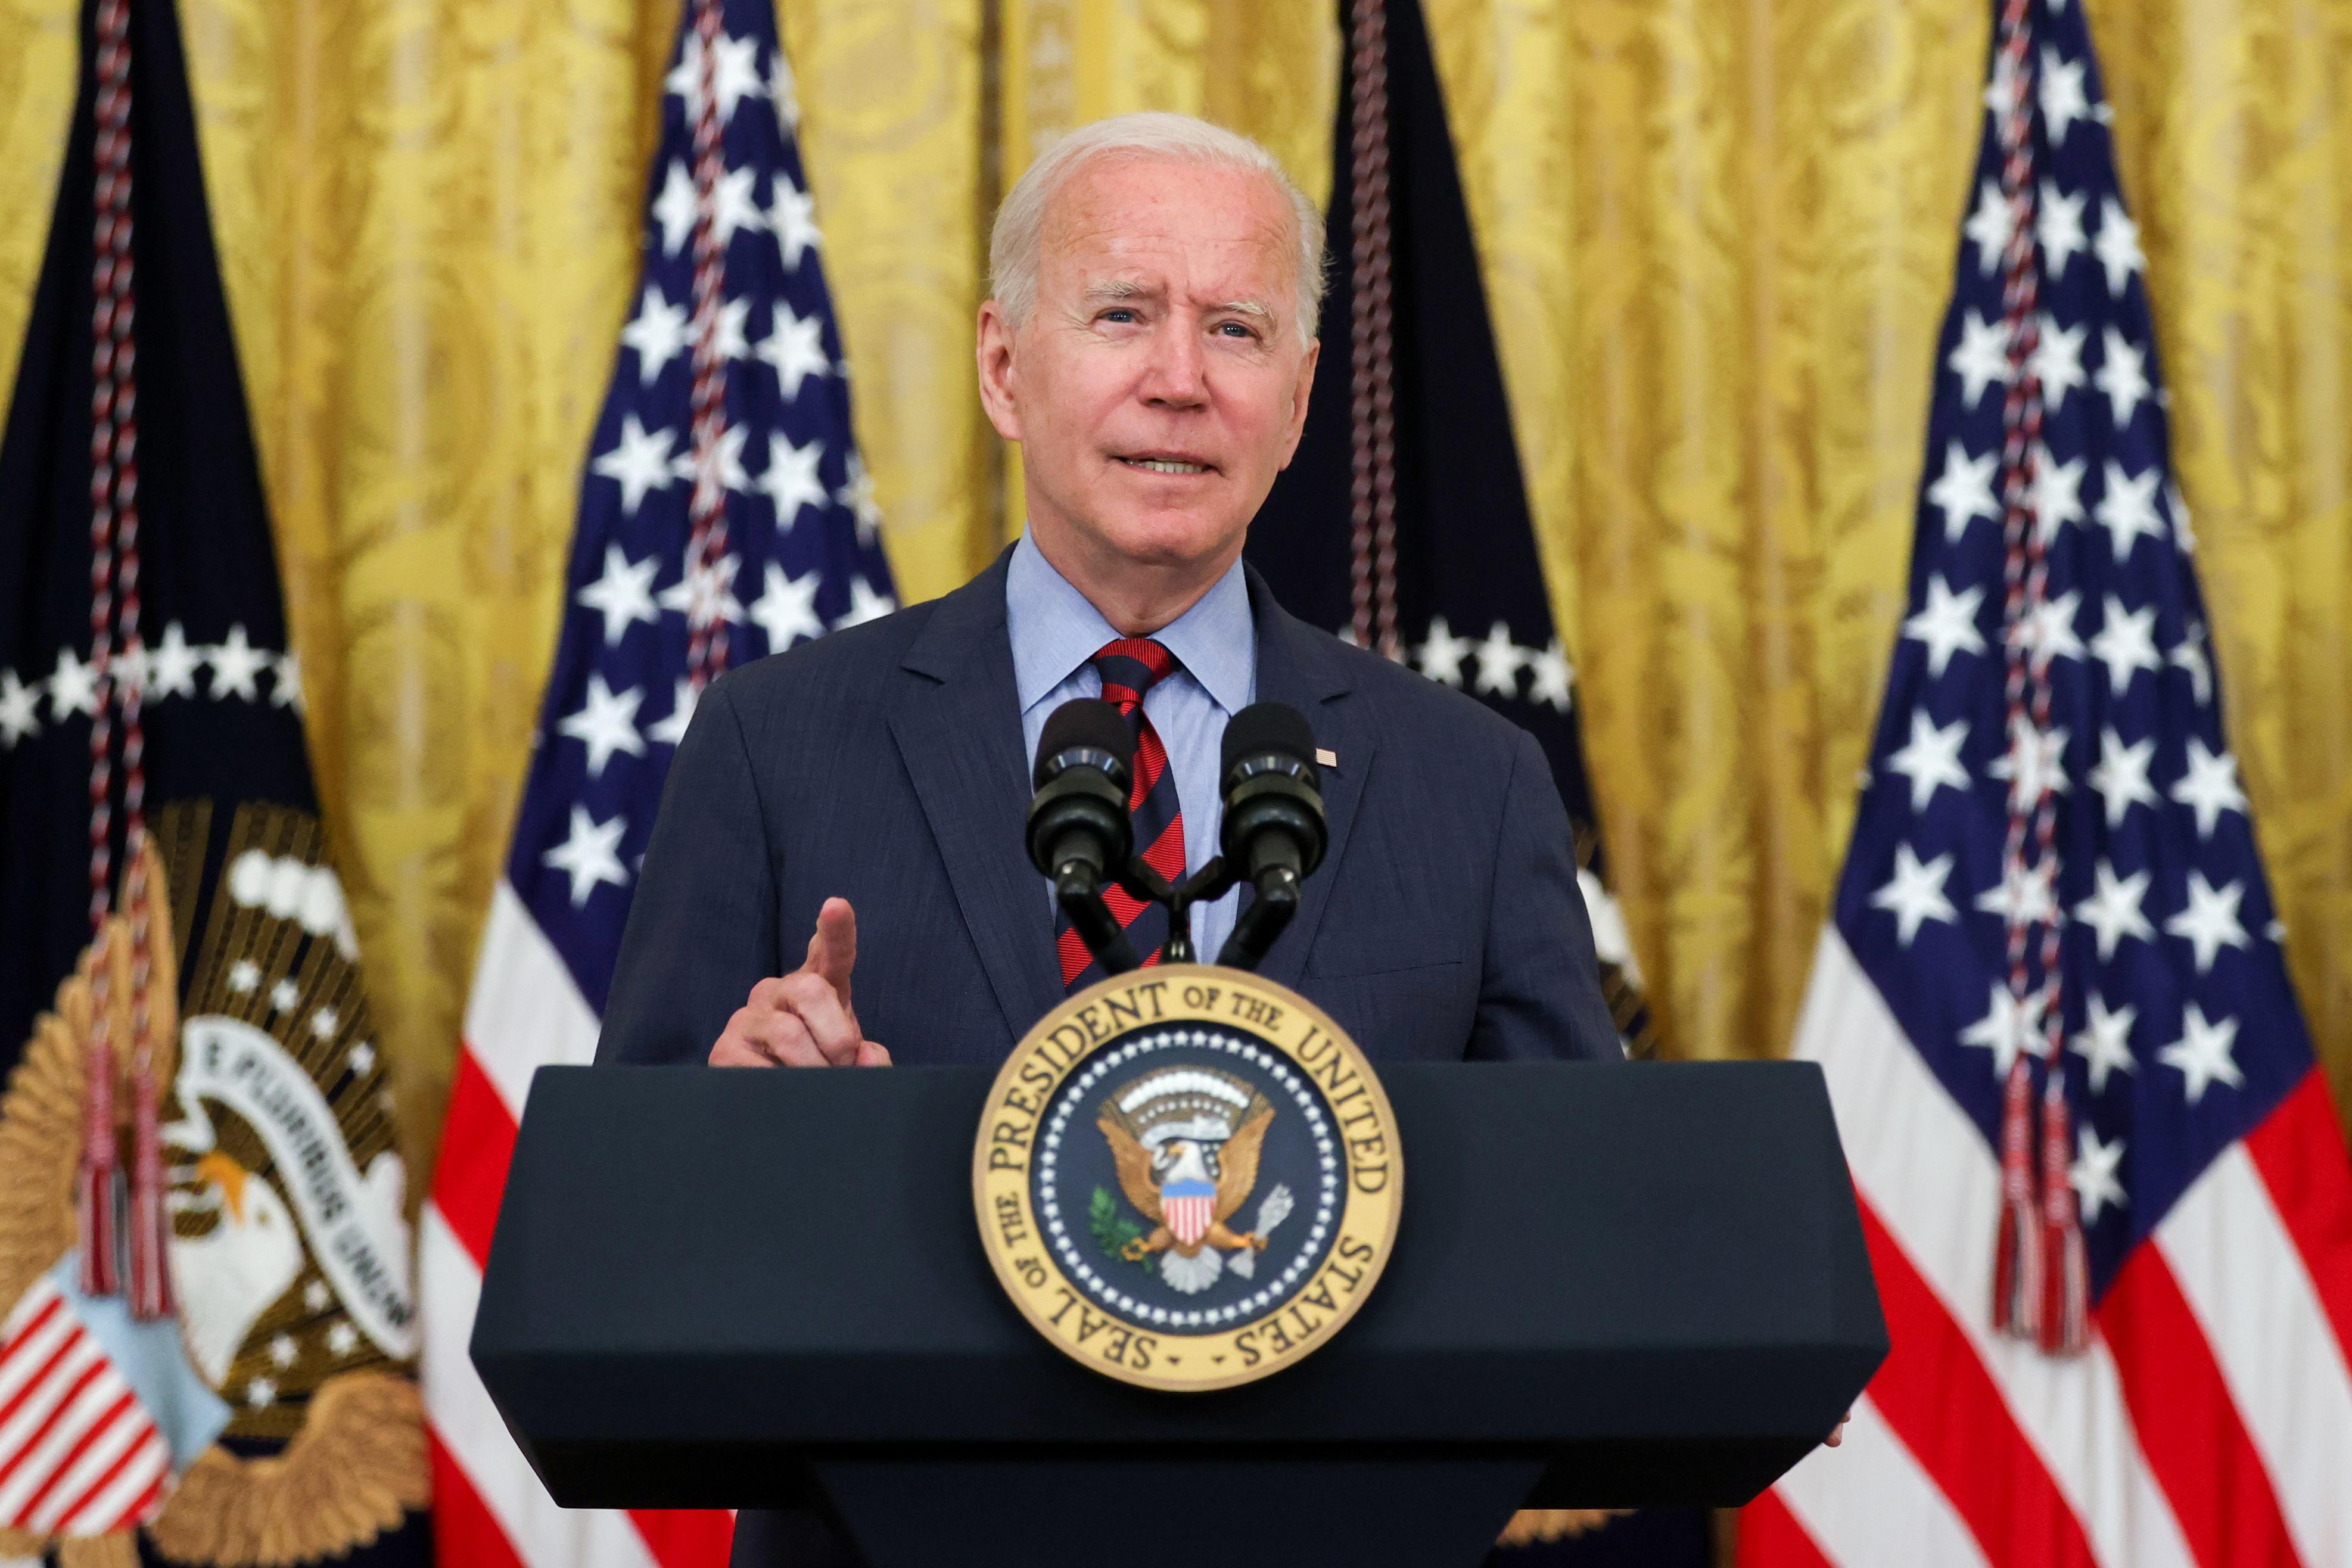 U.S. President Joe Biden delivers remarks at the White House in Washington, U.S. August 3, 2021.  REUTERS/Jonathan Ernst